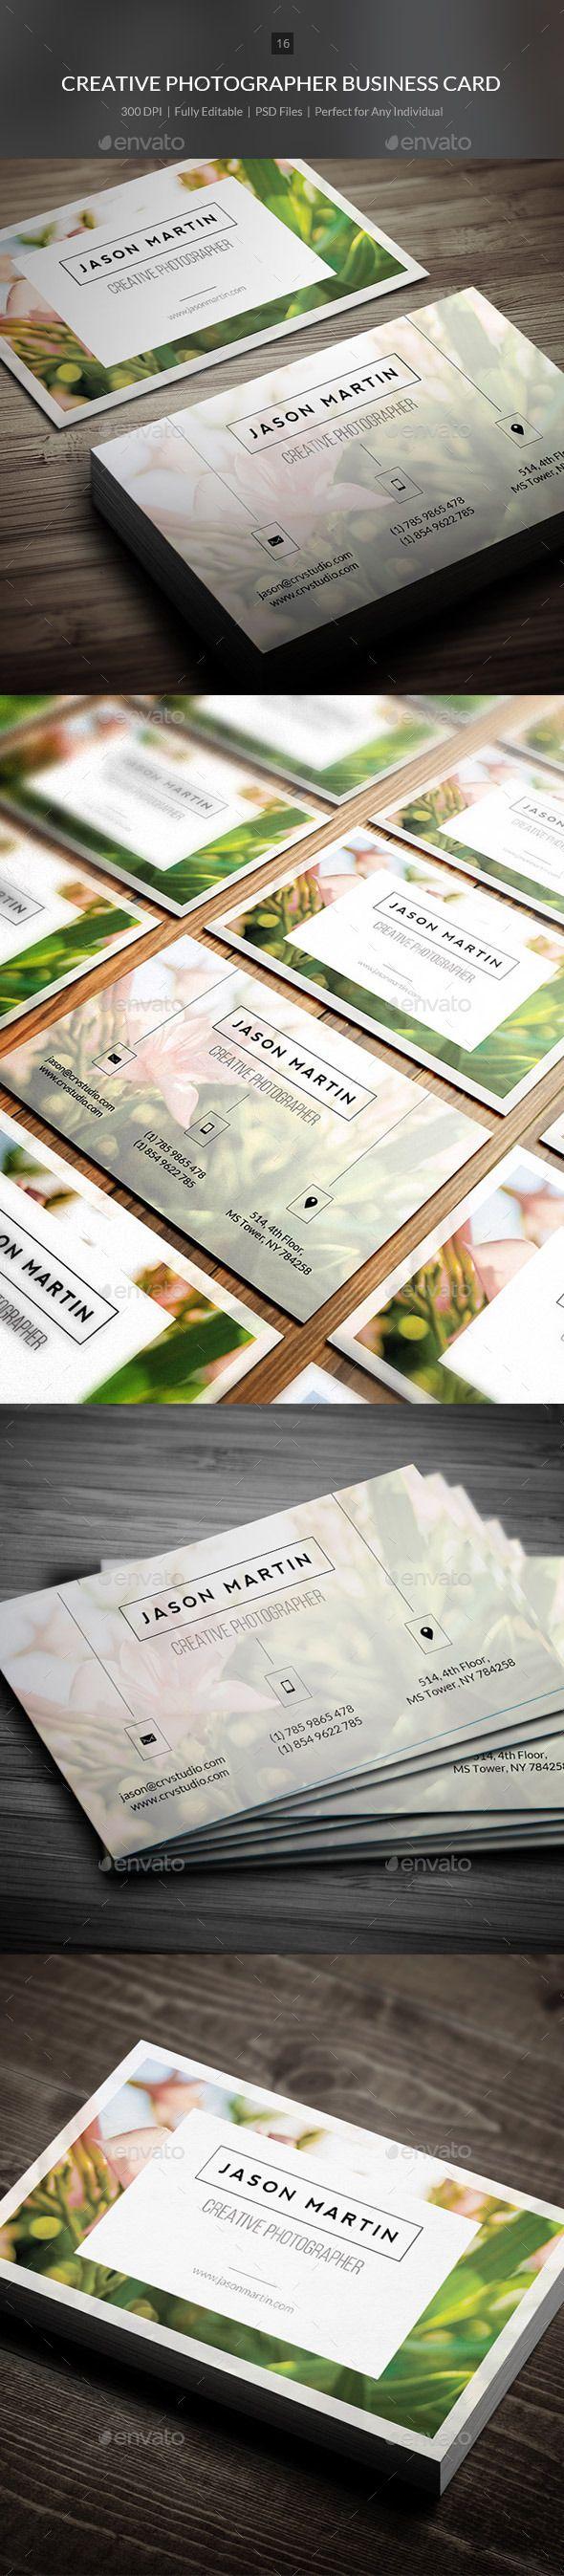 Creative Photographer Business Card - 14 | Photographer business ...